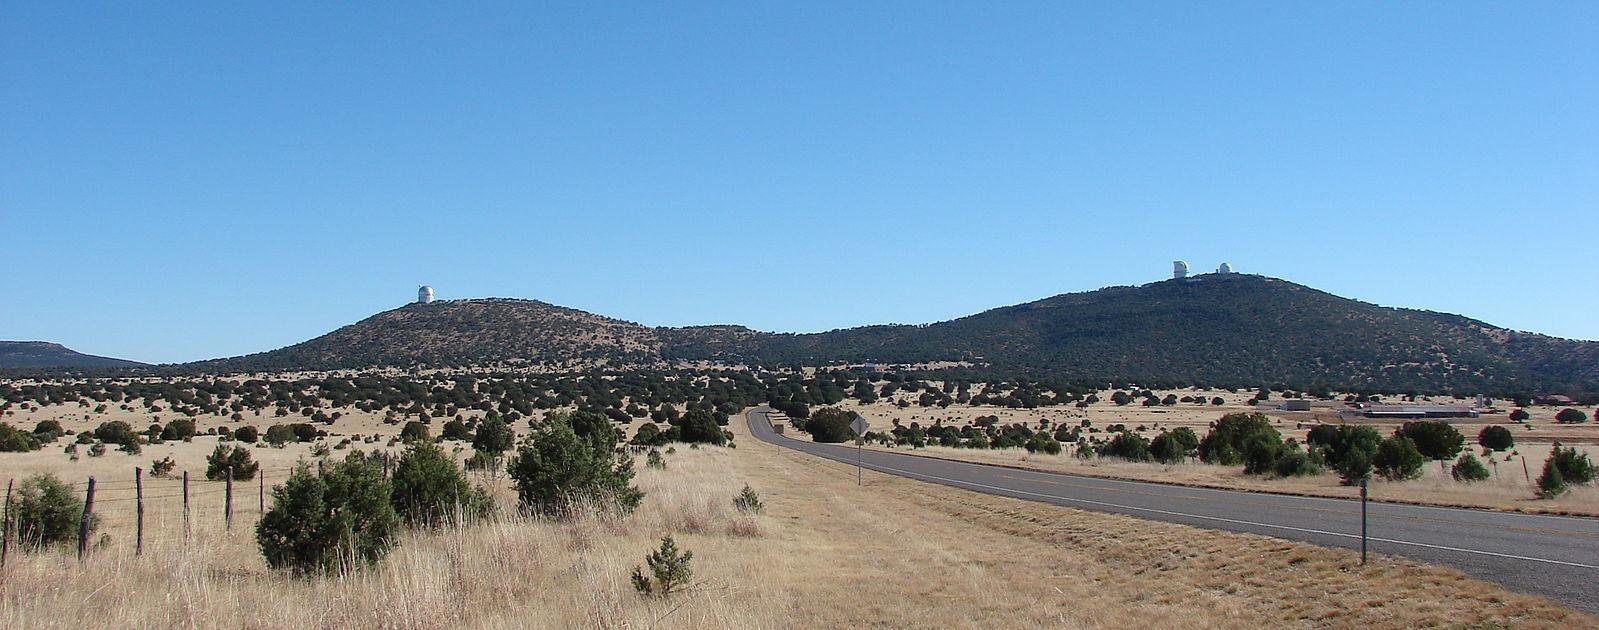 Hwy 118 to McDonald Observatory Bike Climb - PJAMM Cycling